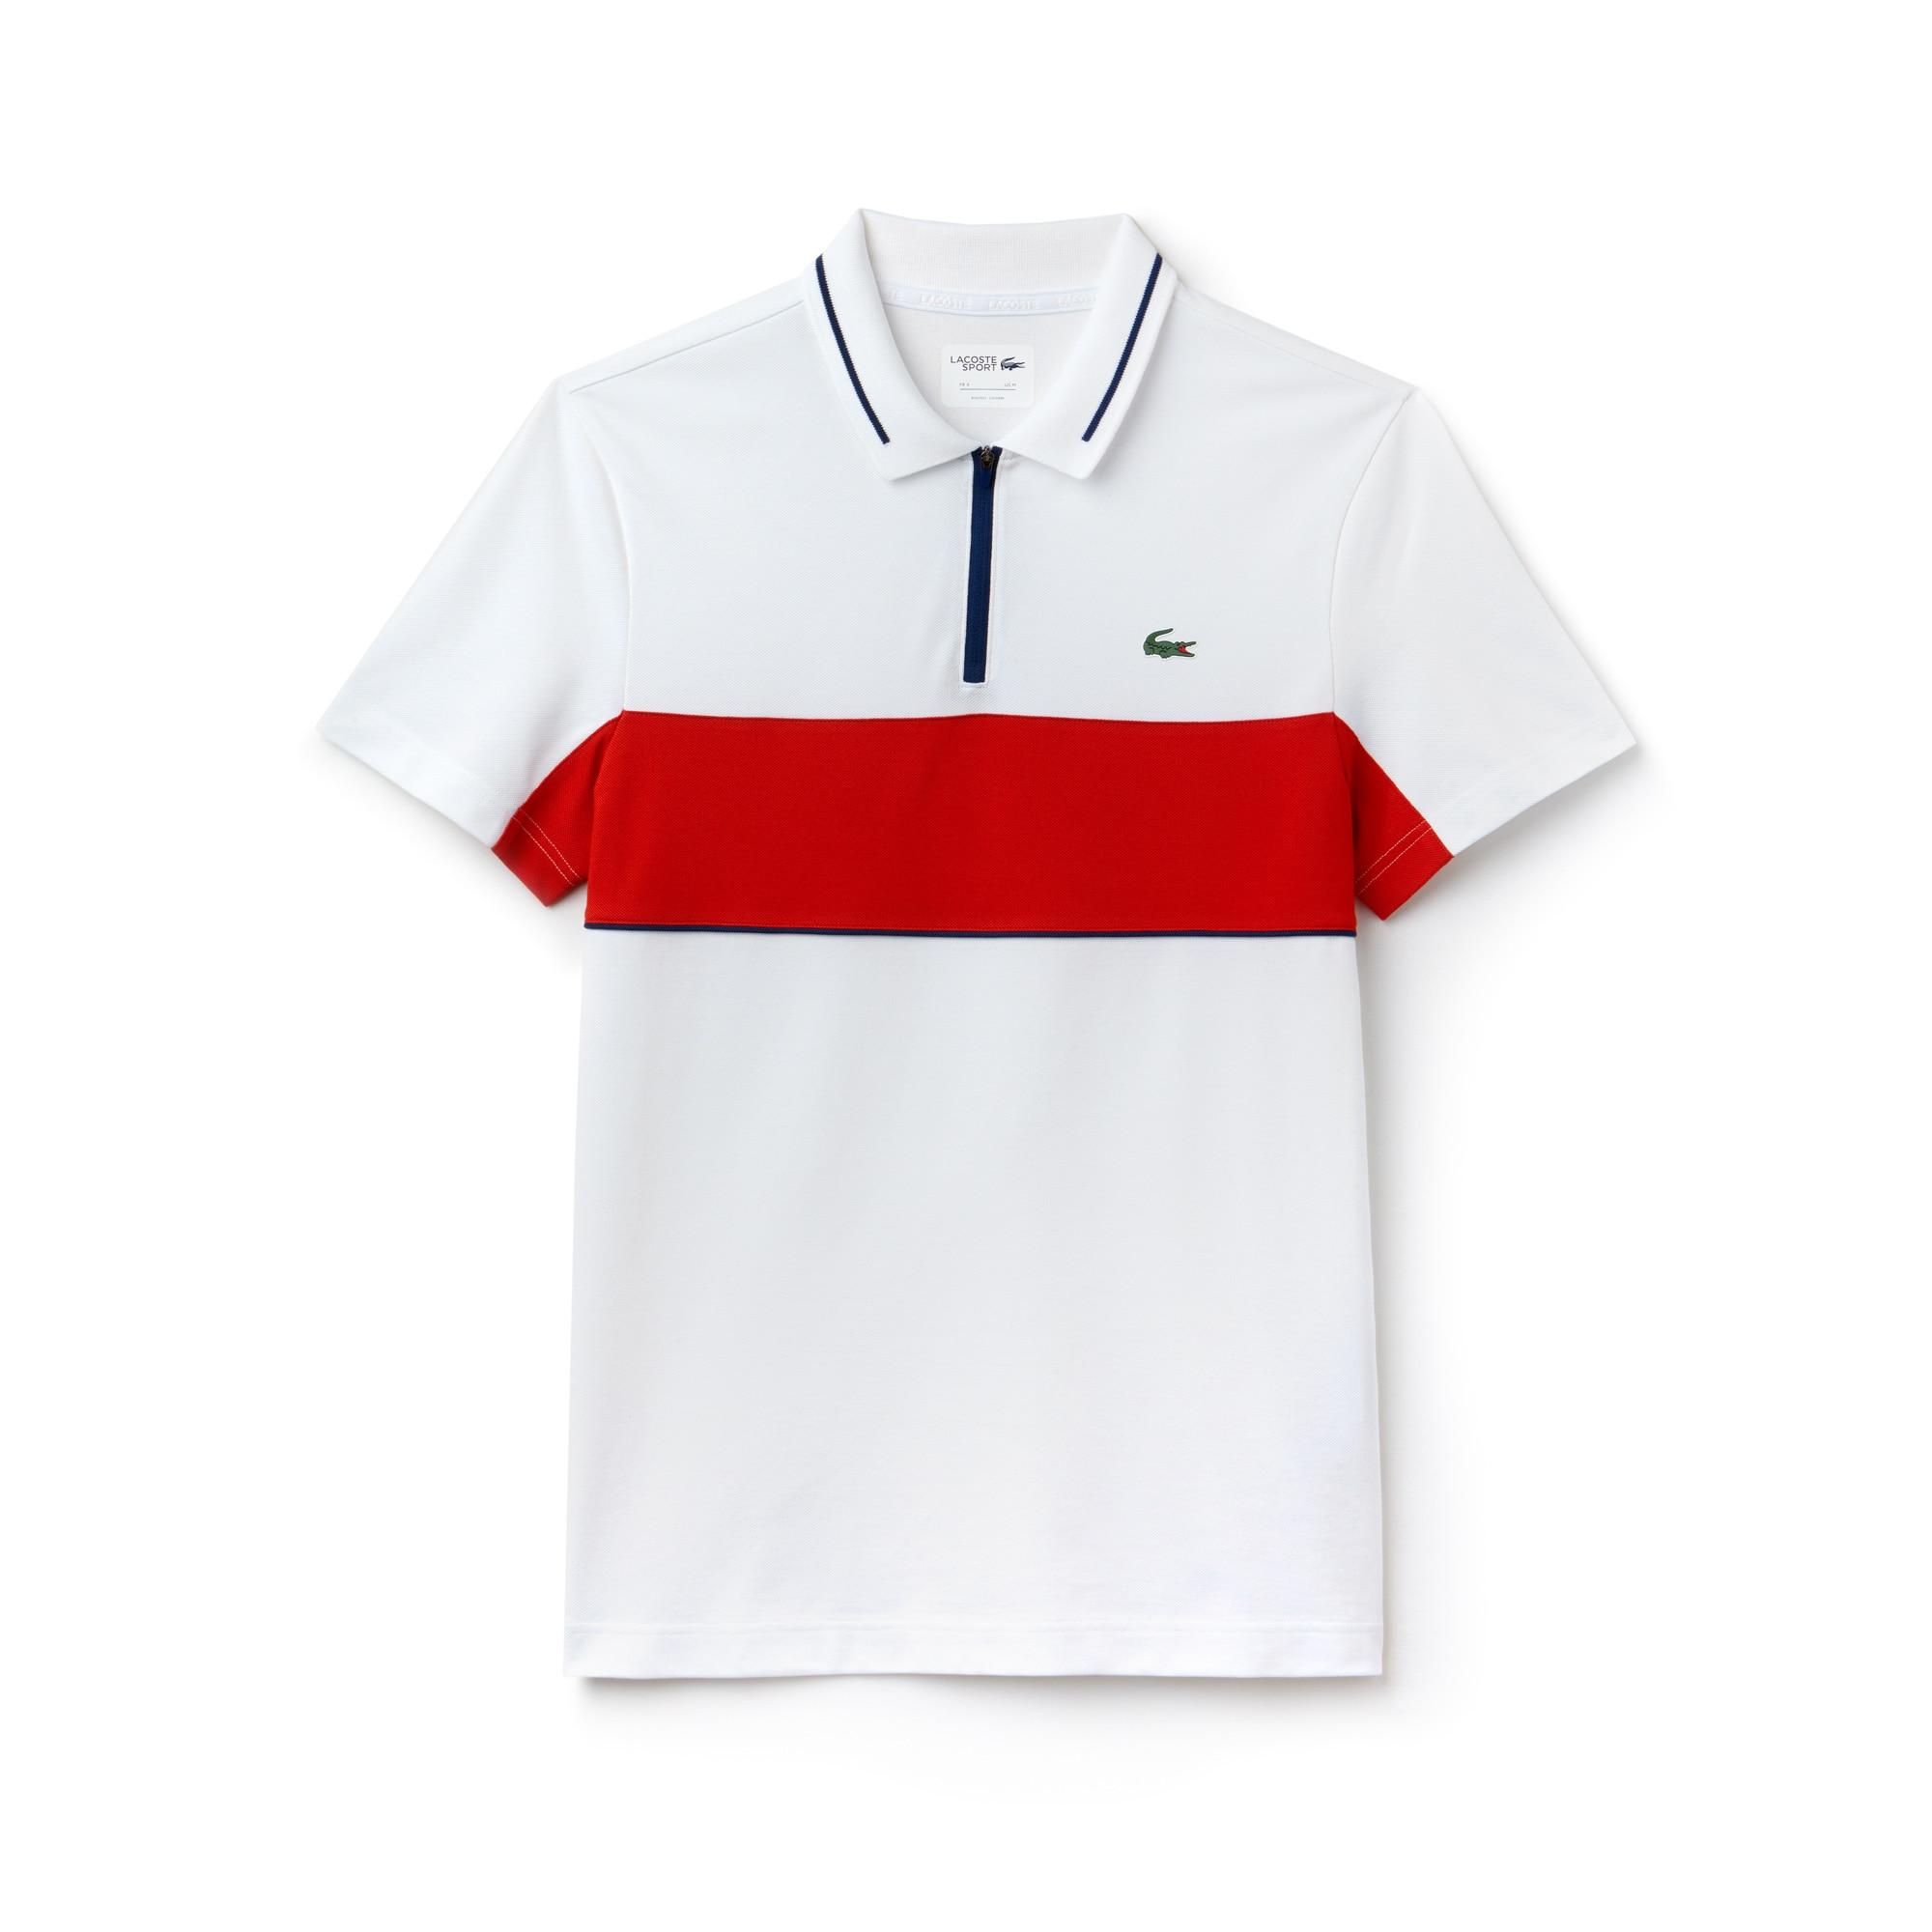 Men's Lacoste SPORT Contrast Bands Technical Piqué Golf Polo